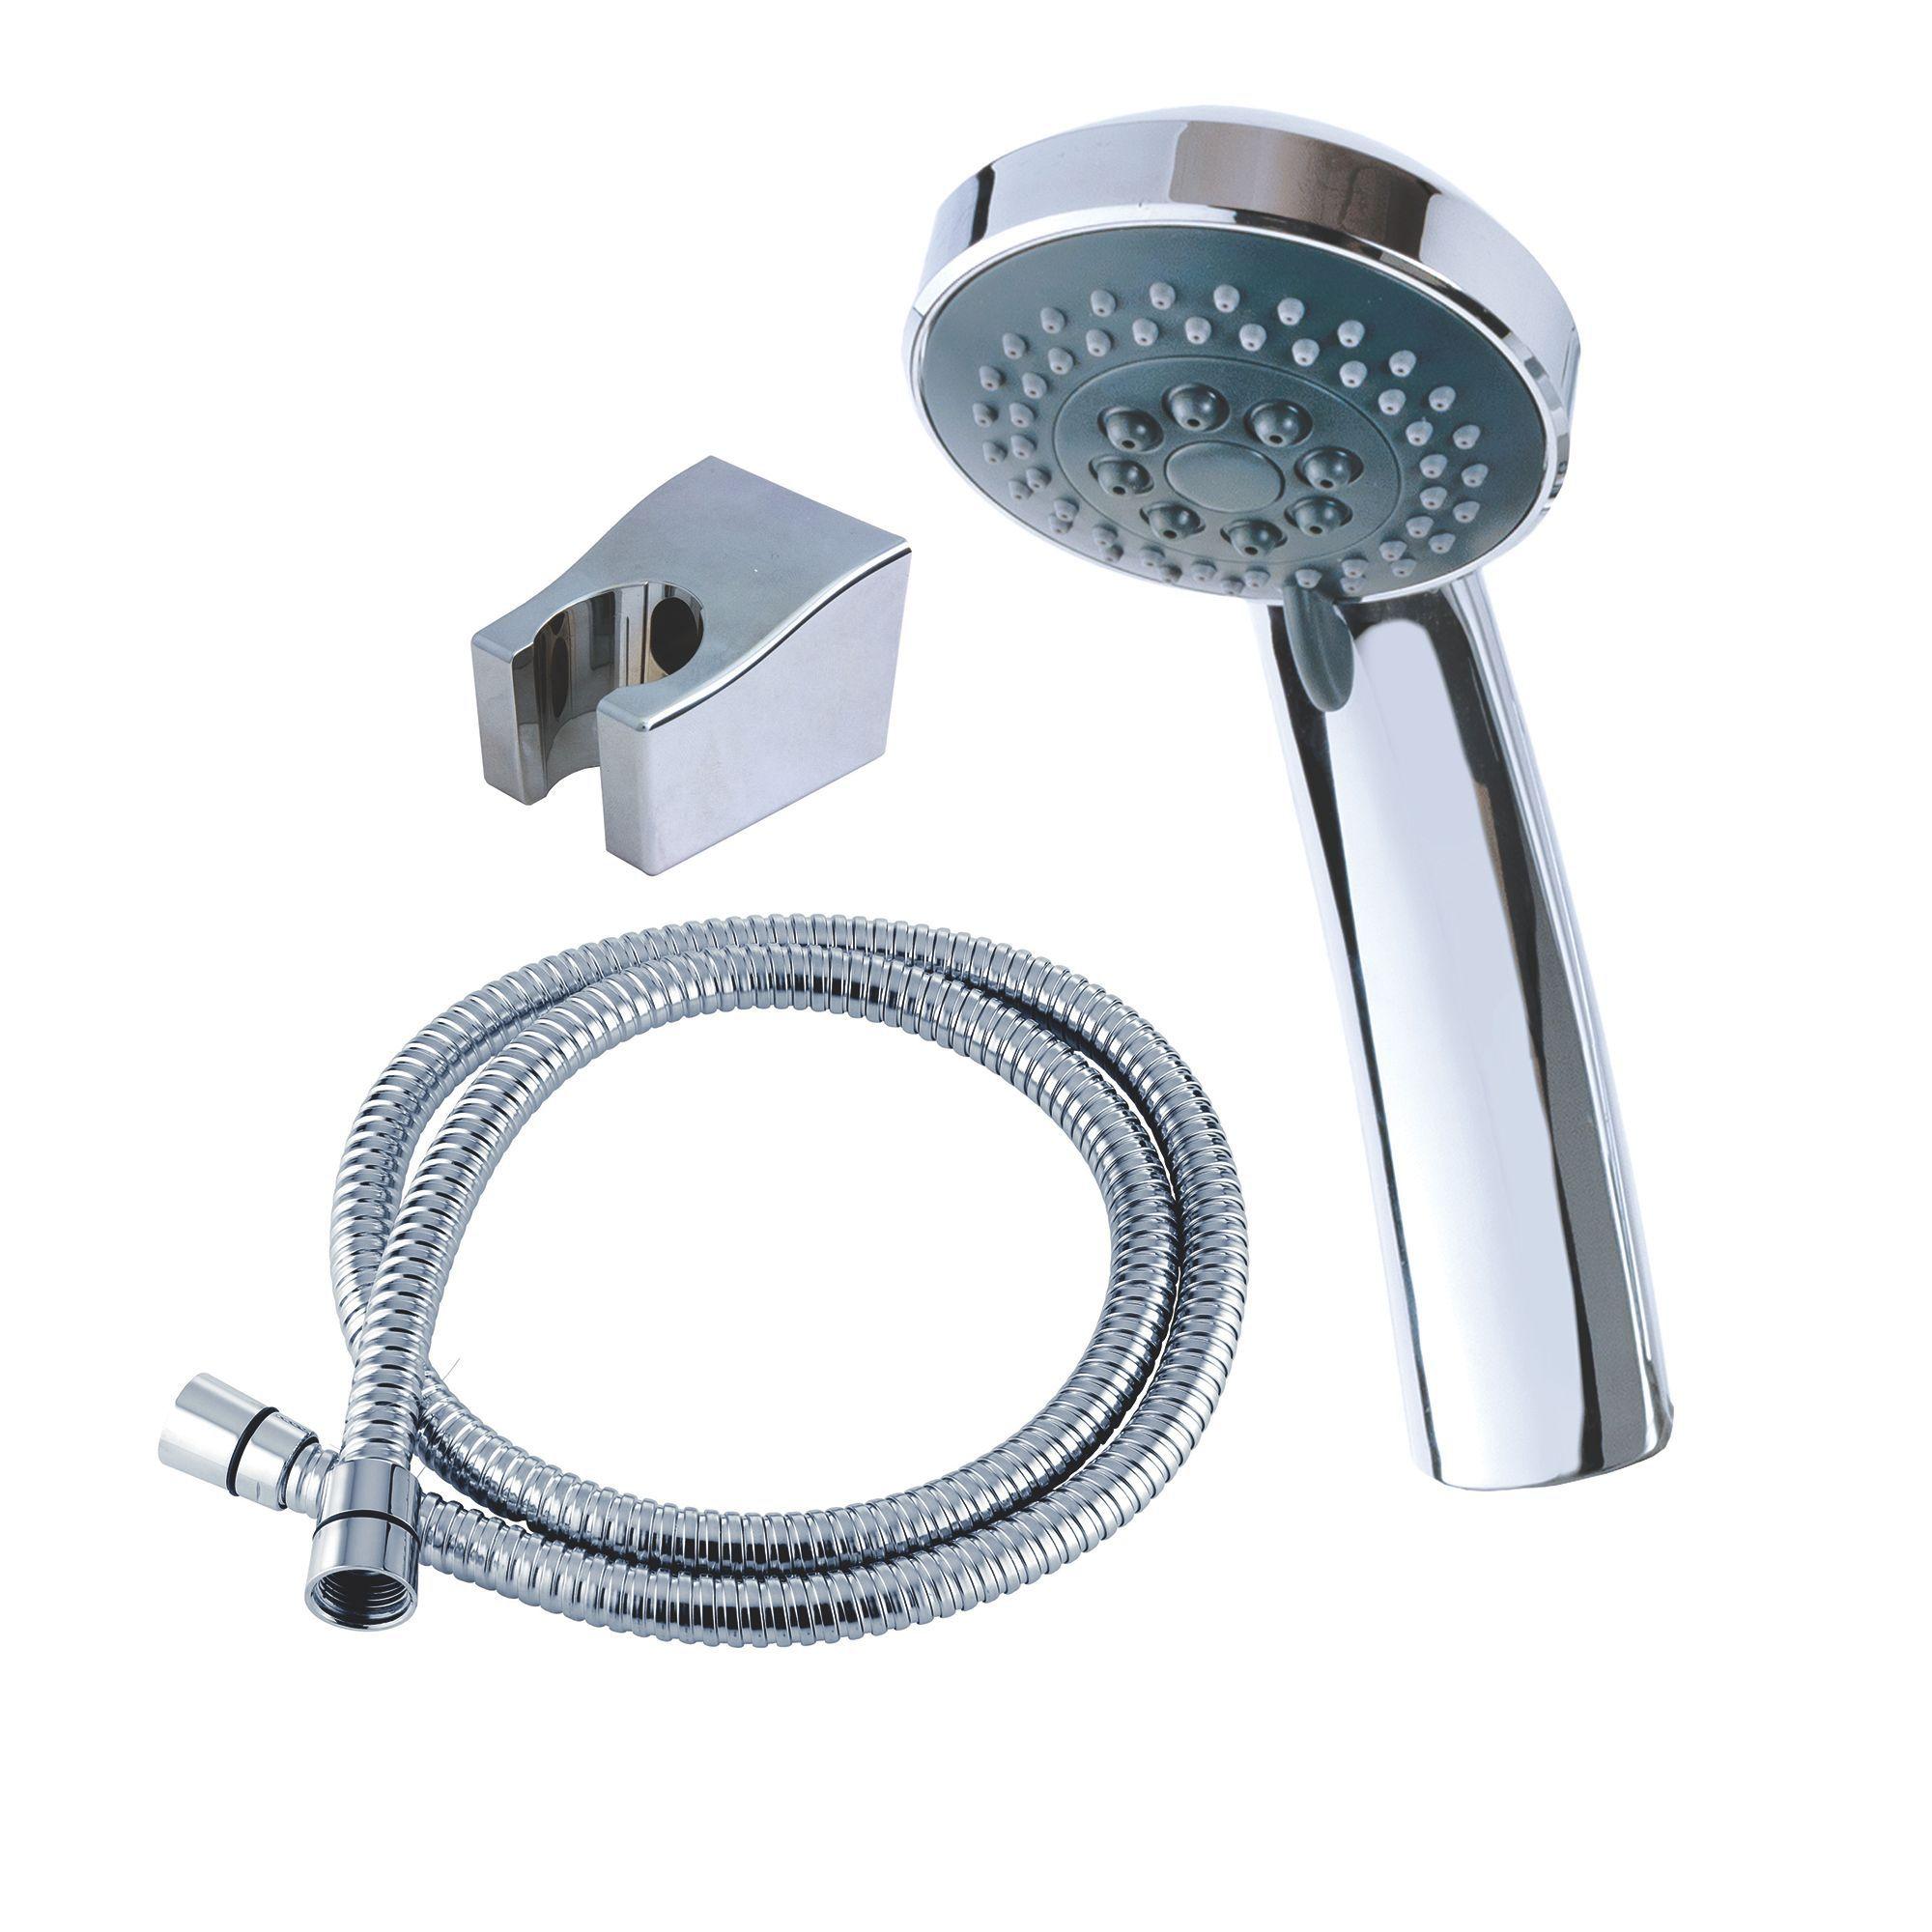 Bath Taps With Shower Head Triton Silver Chrome Effect Shower Head Hose Amp Shower